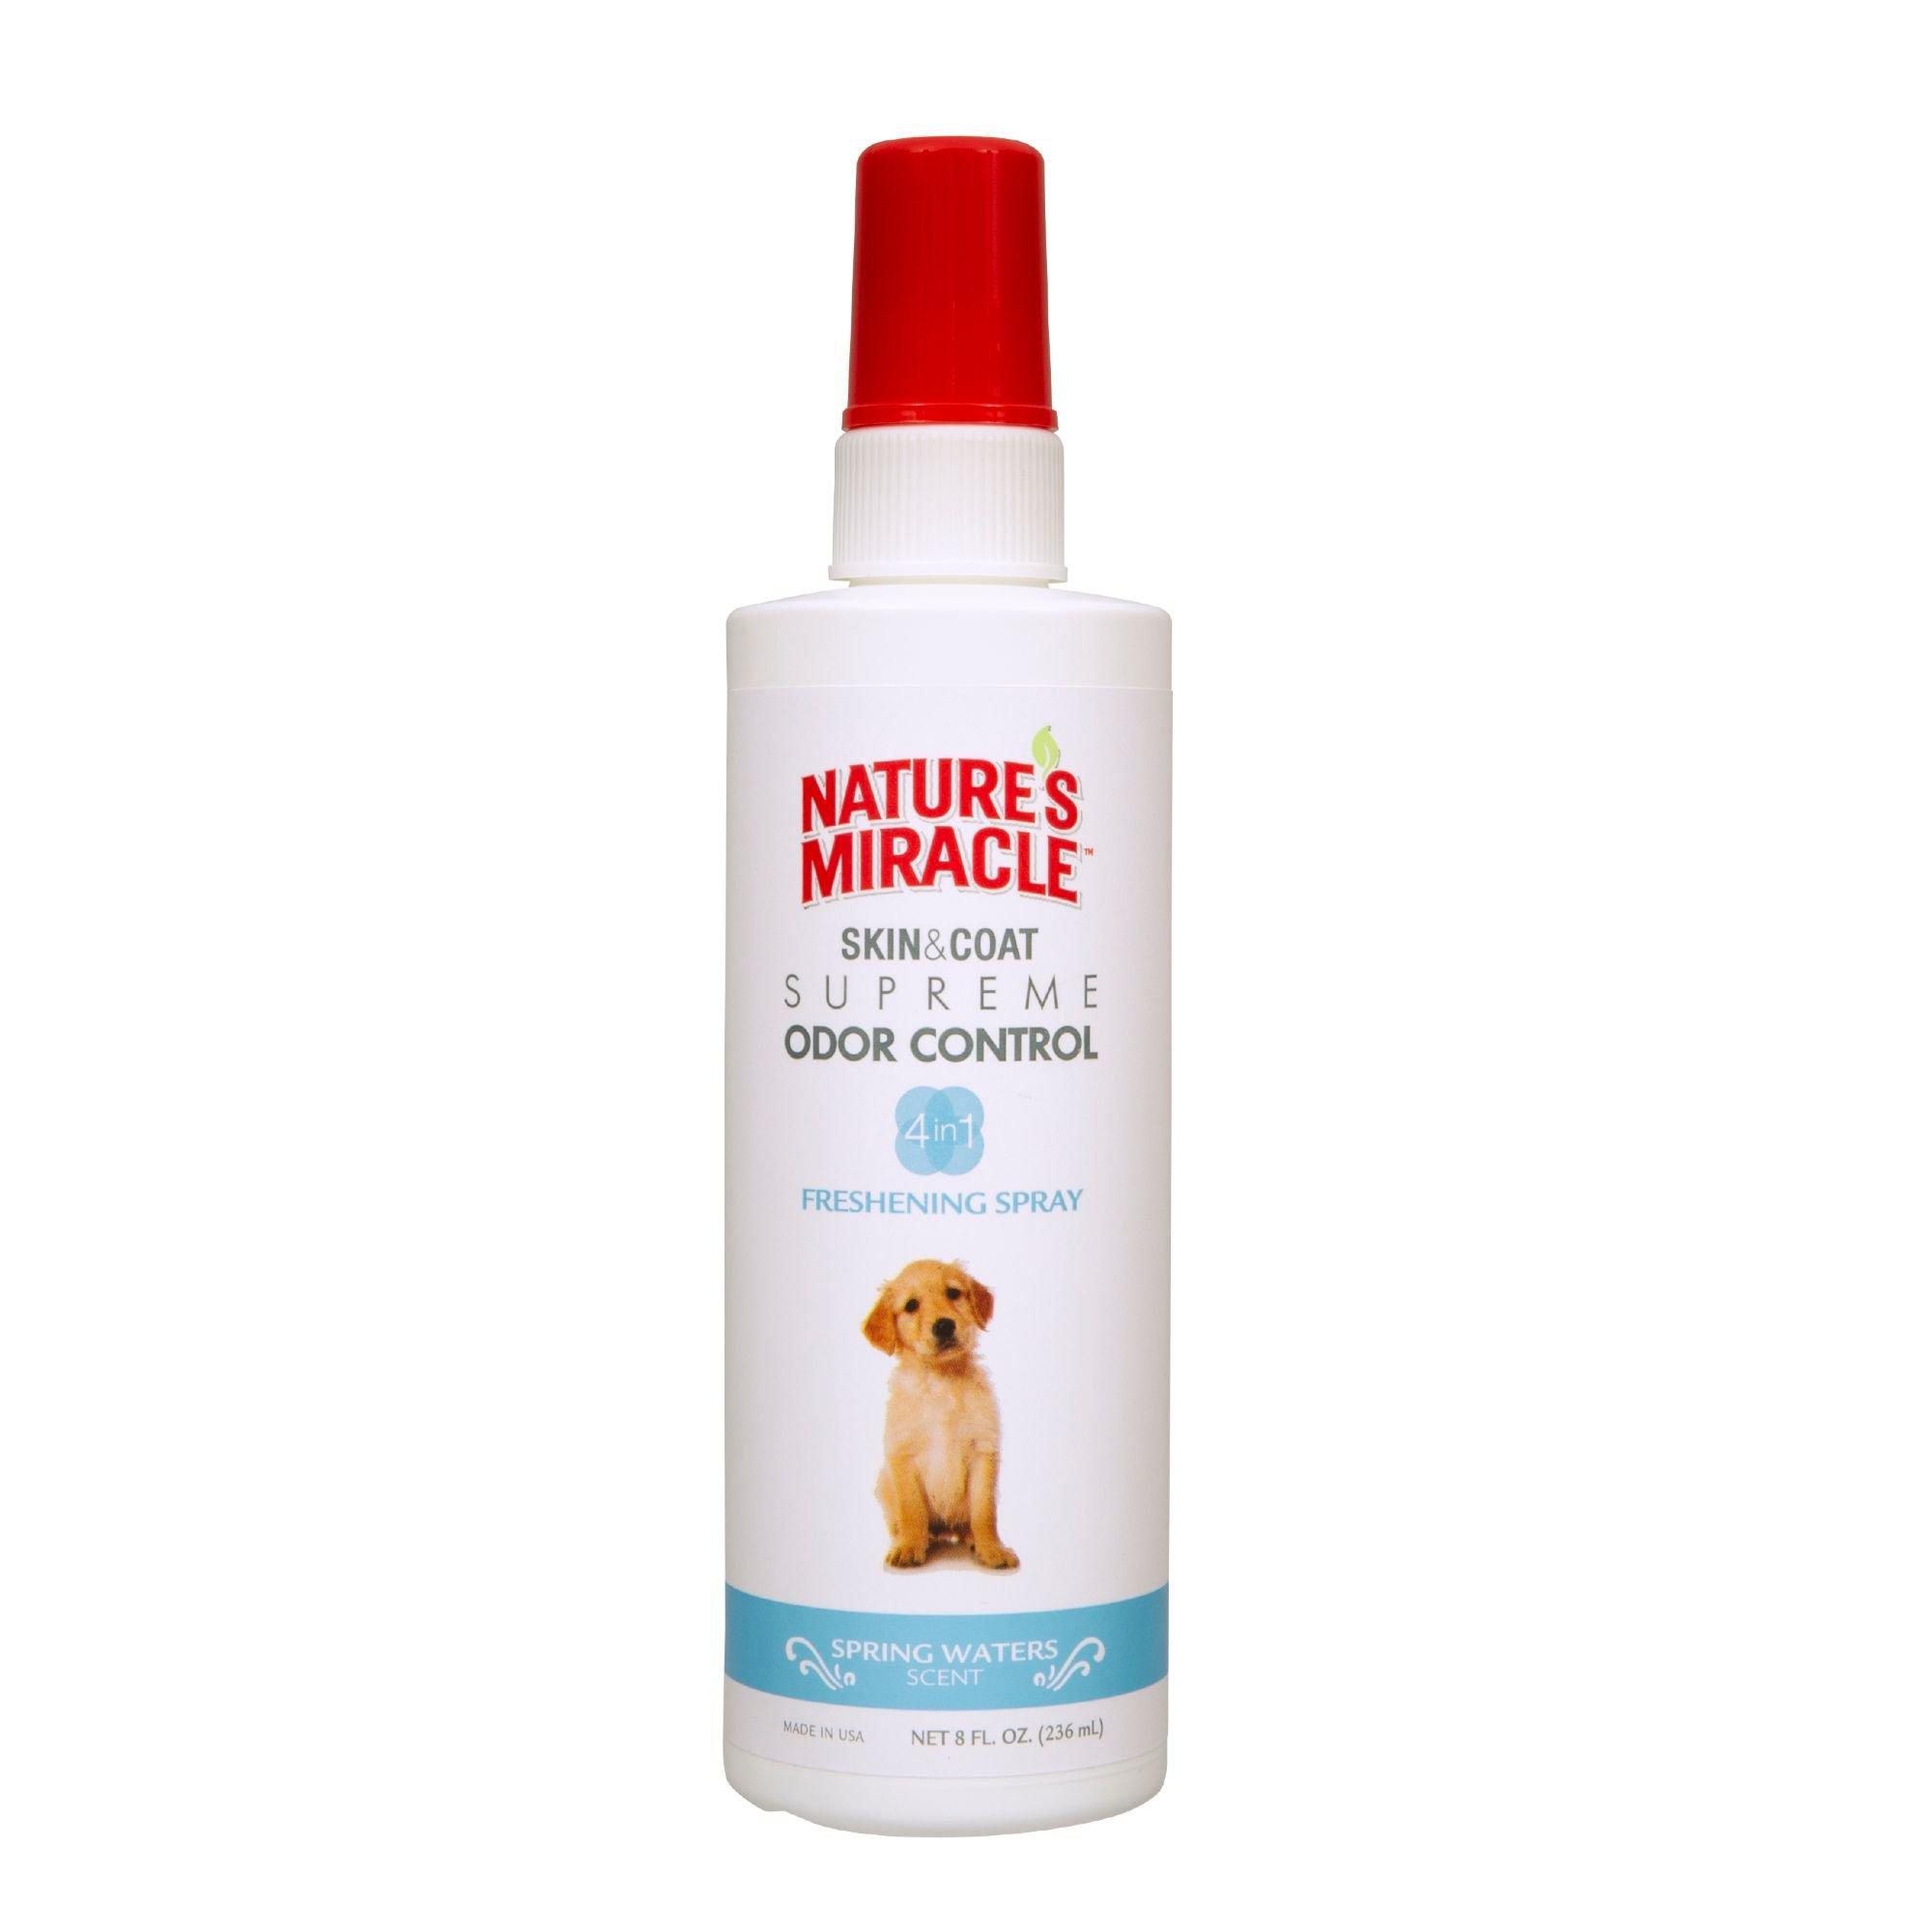 Nature's Miracle Supreme Odor Control Dog Freshening Spray